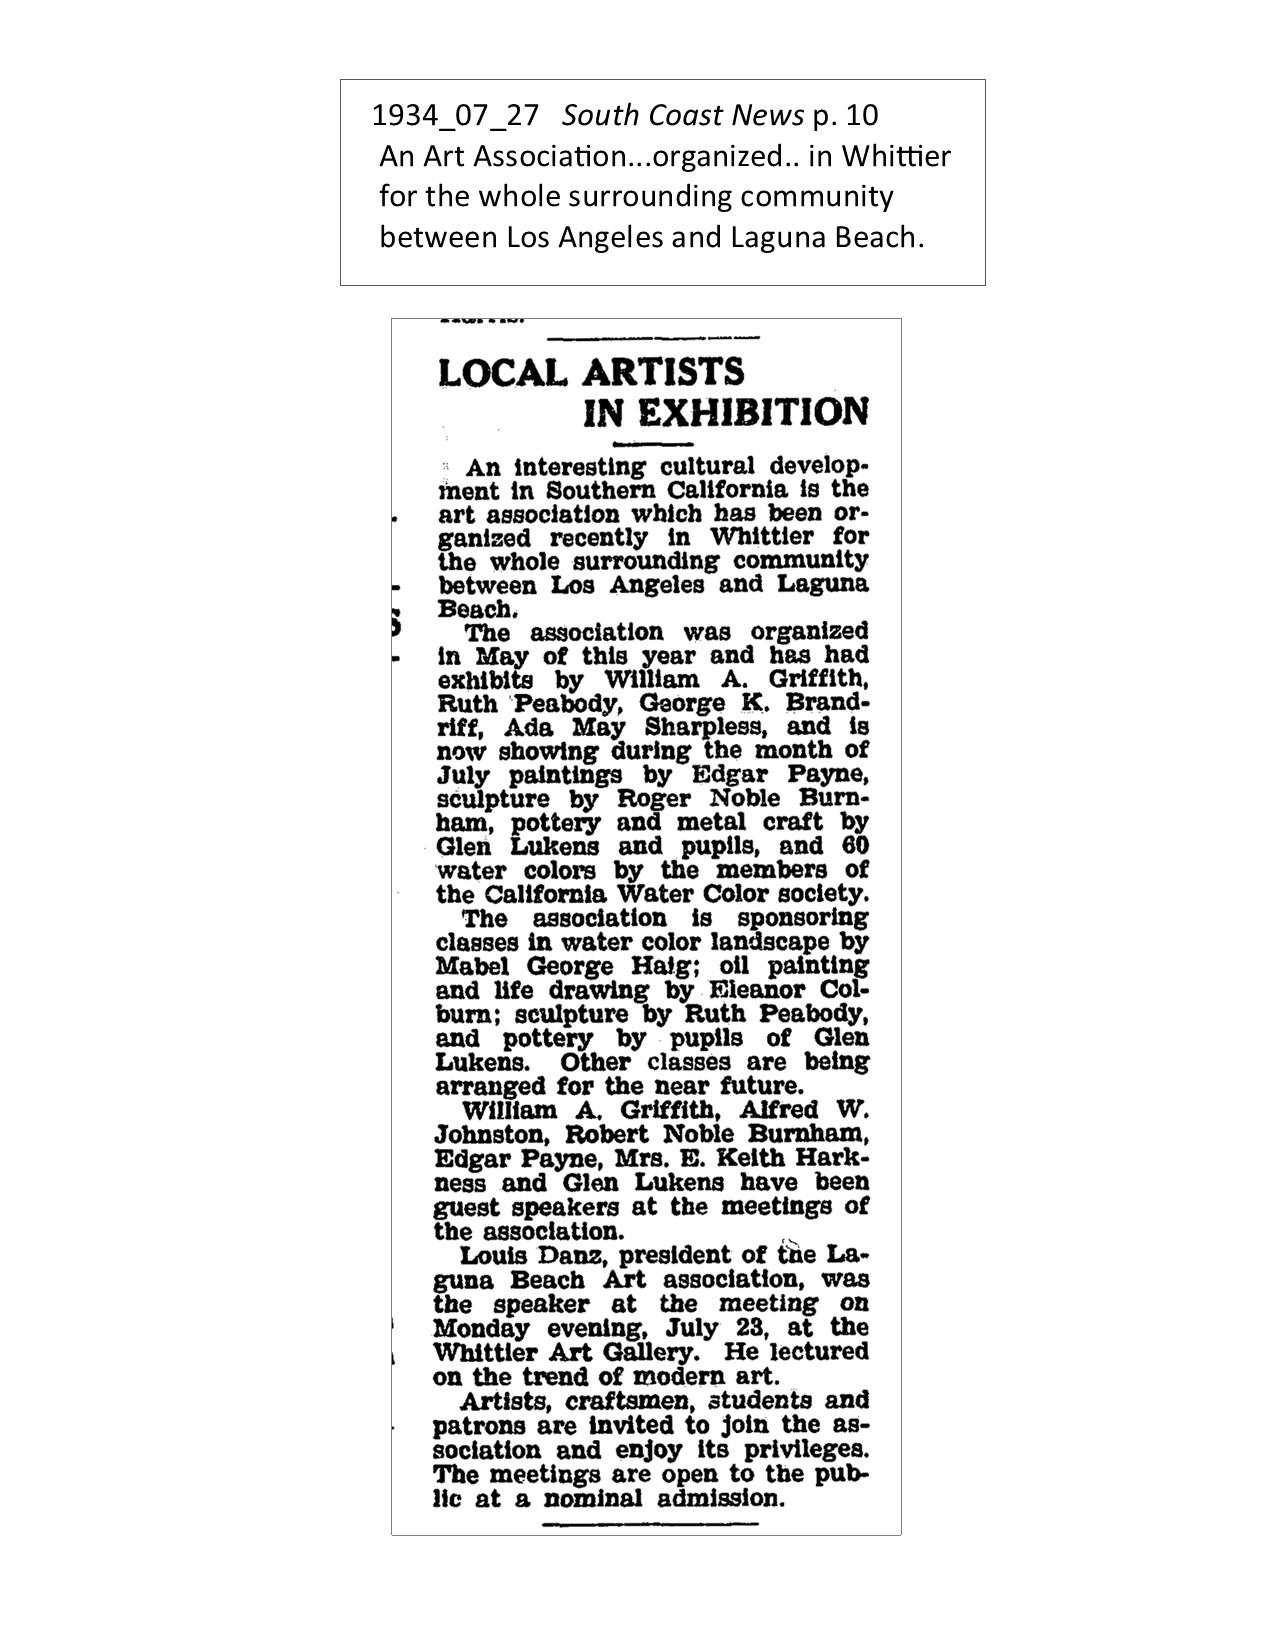 1934_07_27 South Coast News p. 10 WAA forms for LA to Laguna Beach